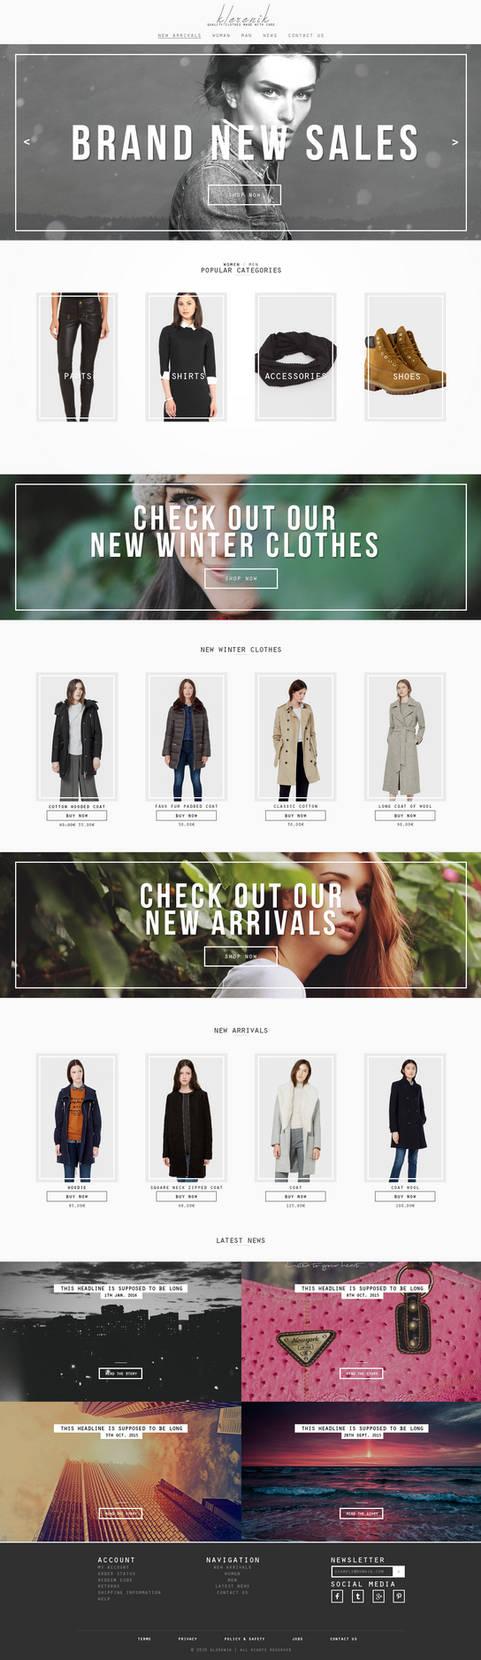 Responsive Clothing Store Website Design